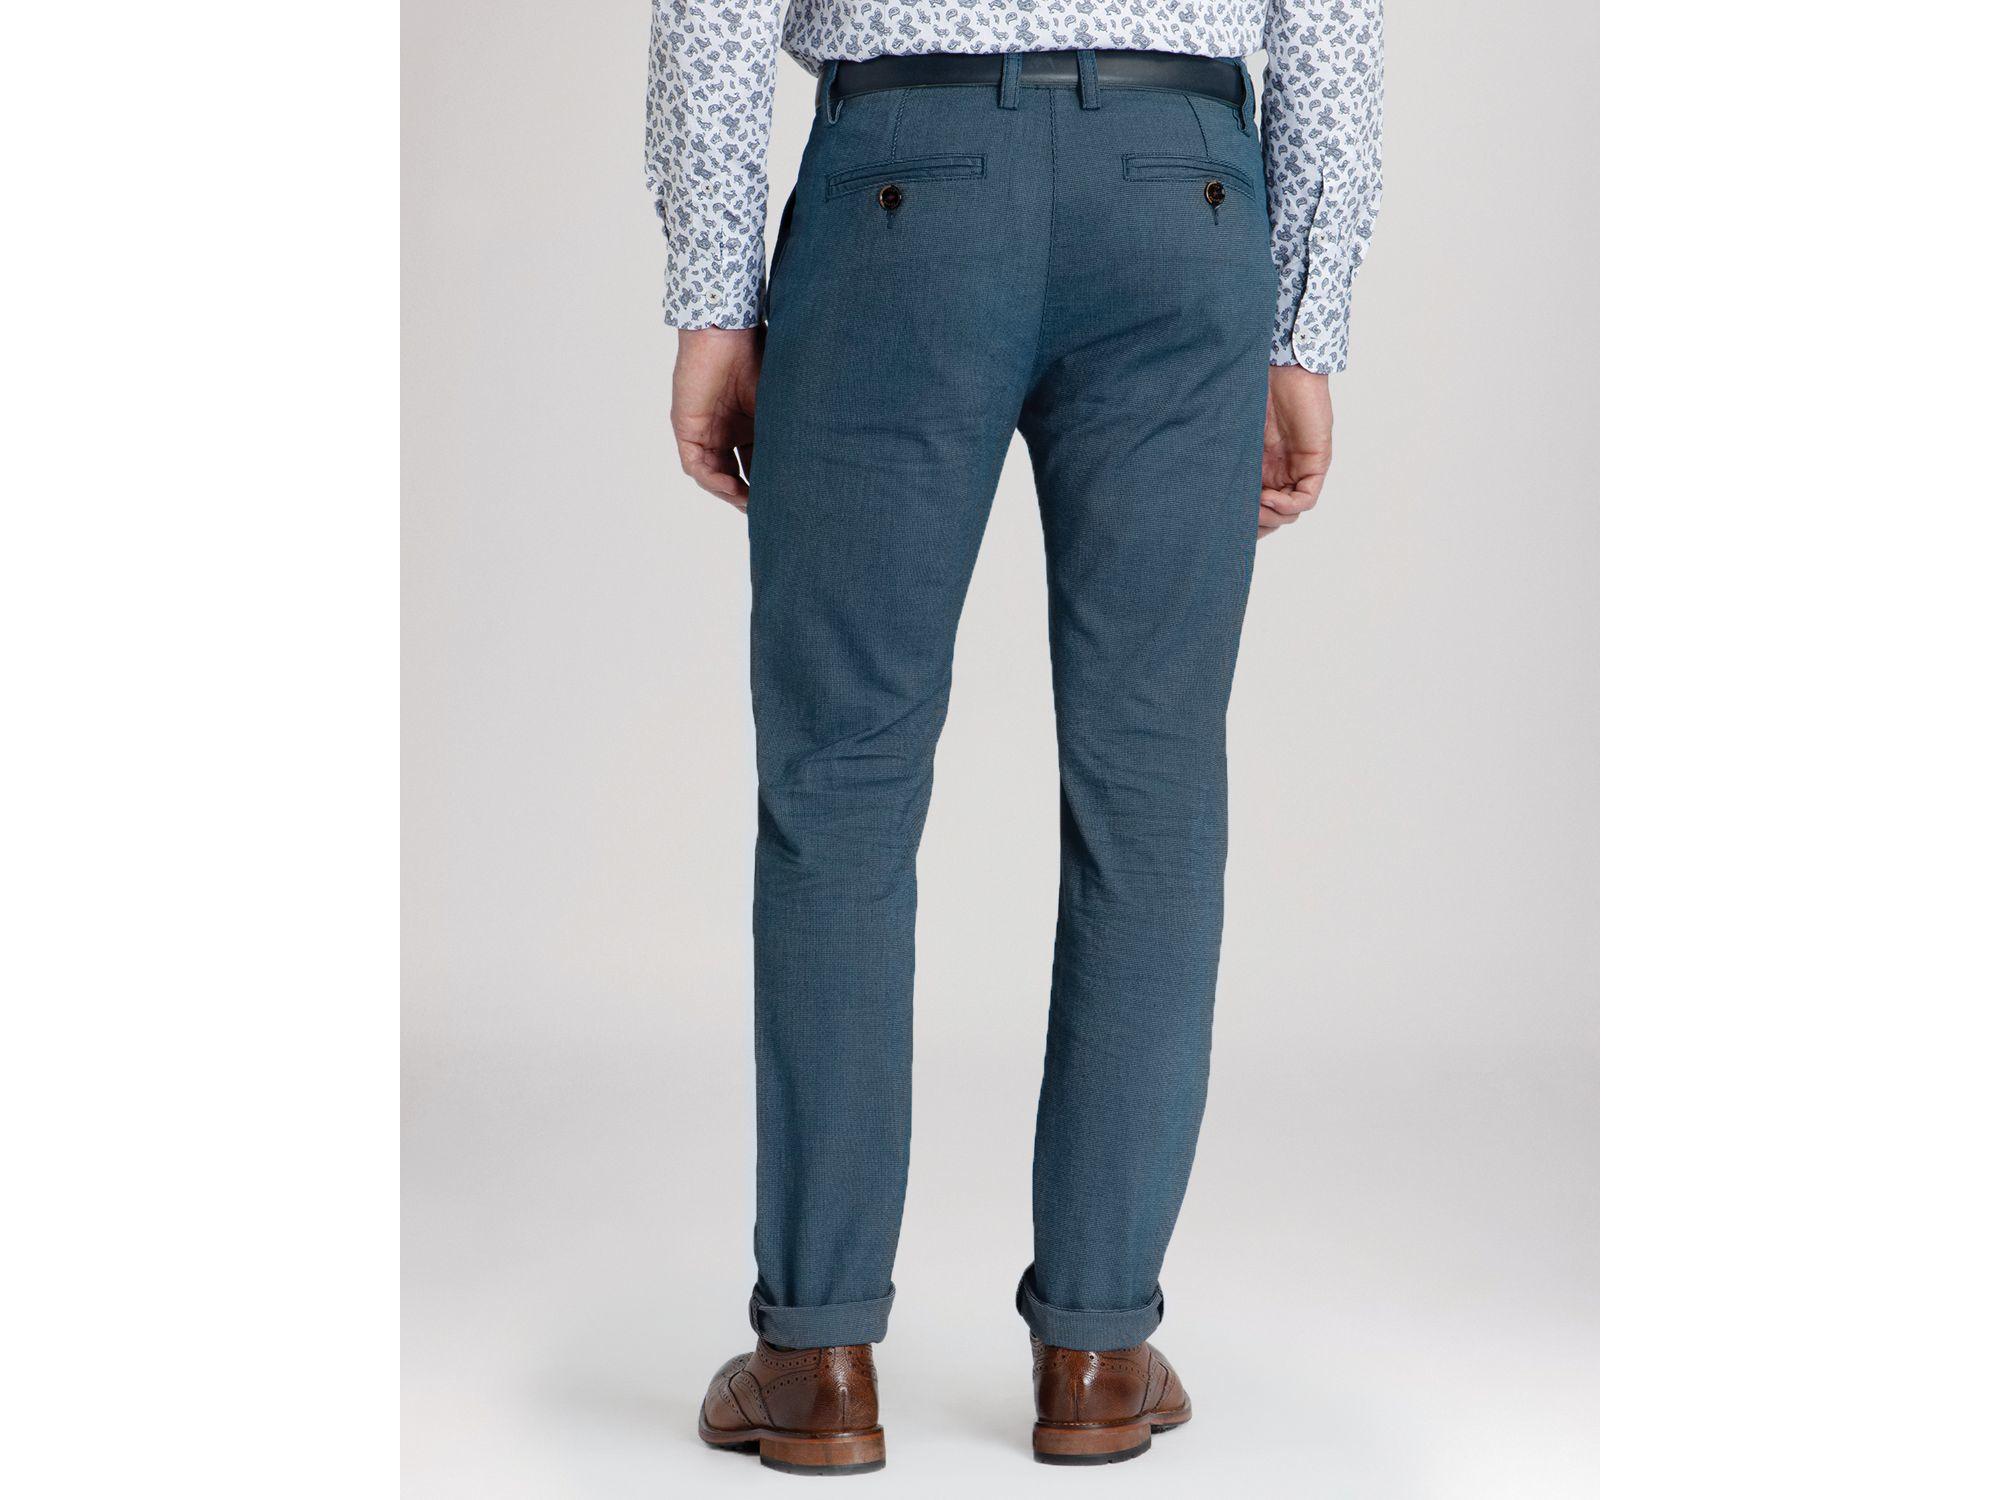 b723175353bb16 Lyst - Ted Baker Hollard Cotton Herringbone Trousers in Blue for Men